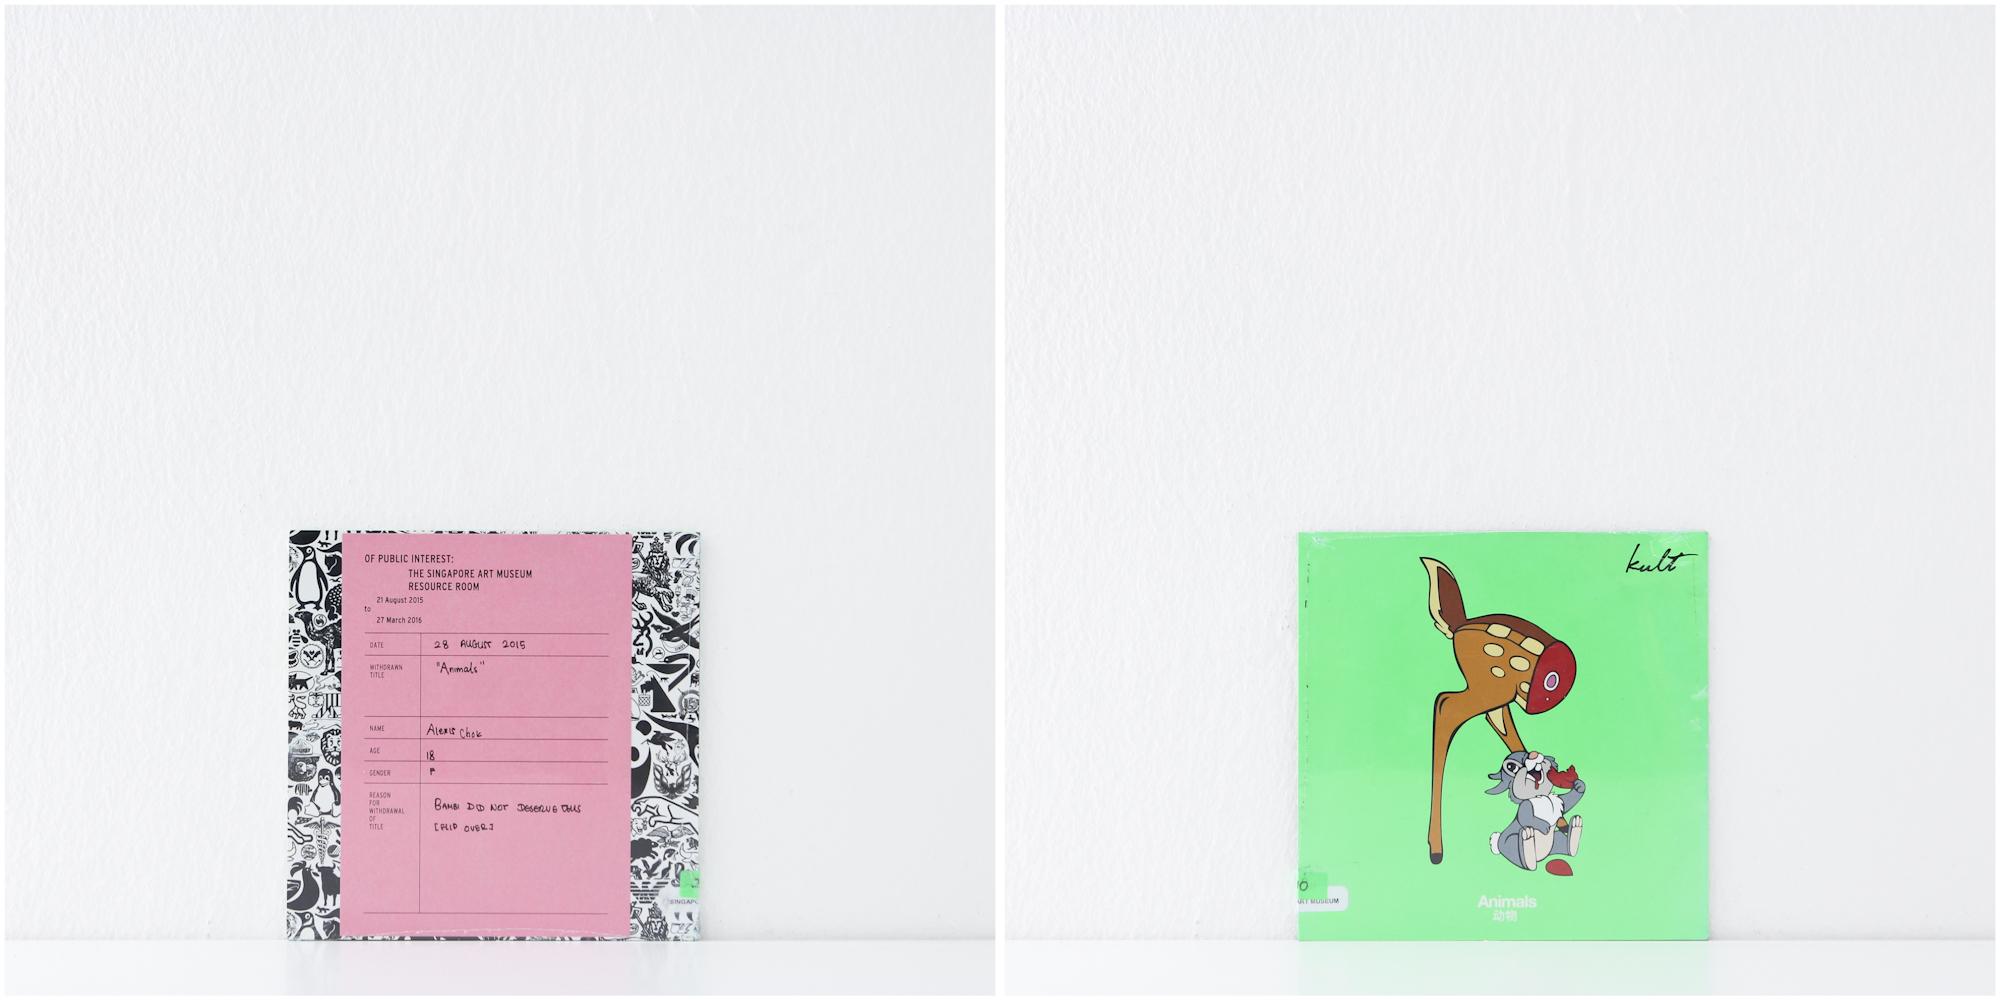 'Kult, Animals', 28/8/15, Alexis Chok, 18, Female